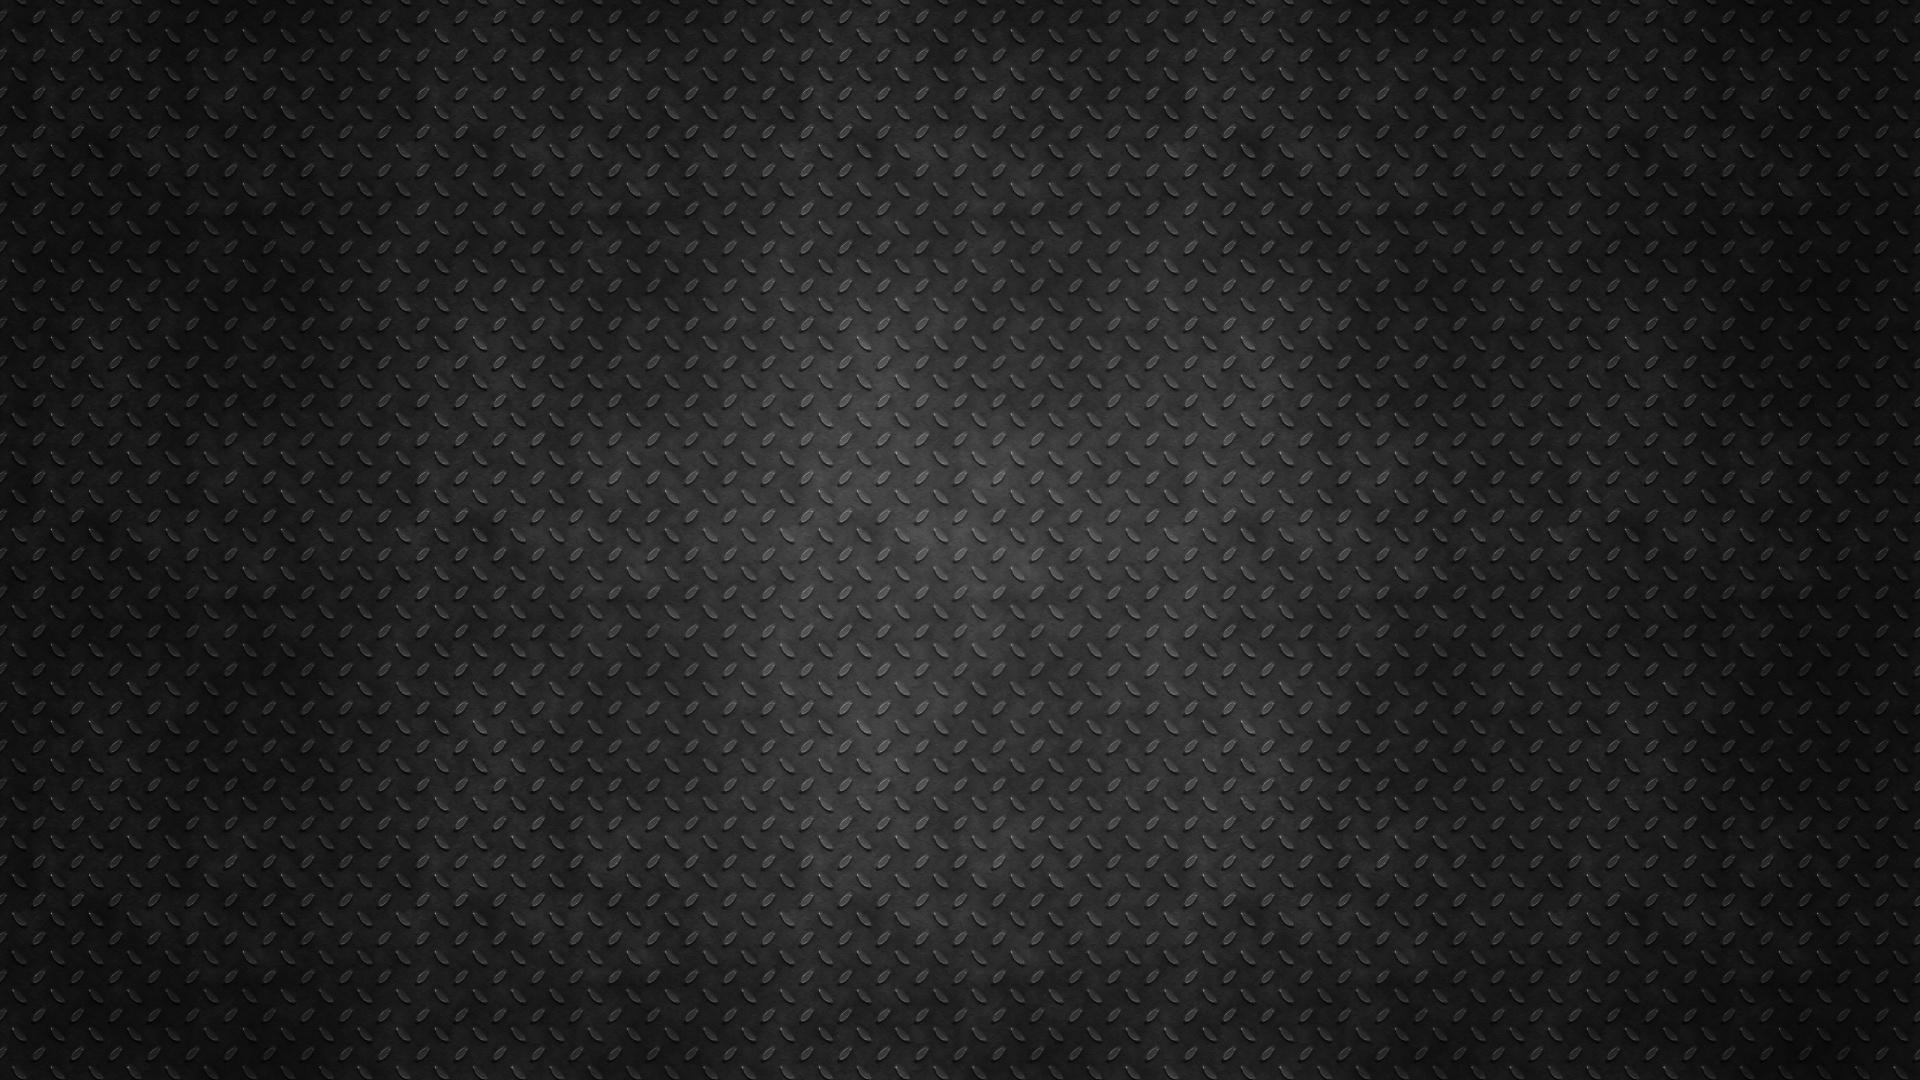 All Black Wallpaper (68+ images)